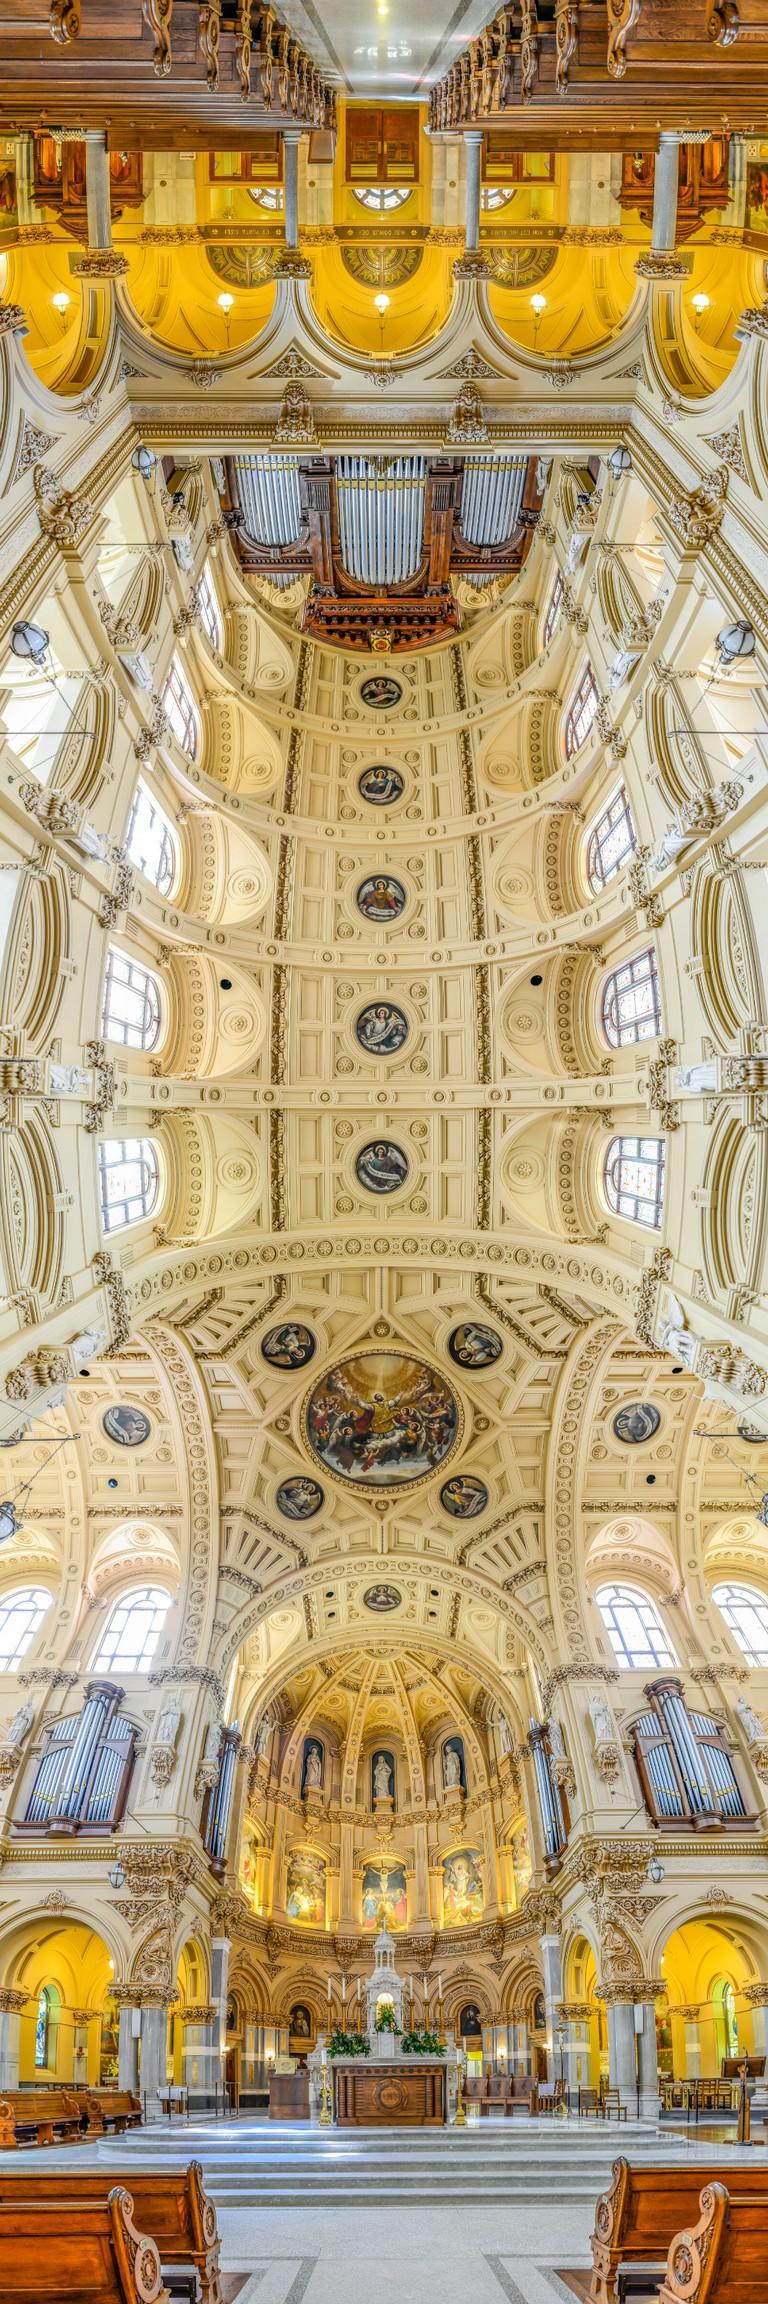 Church of St. Francis Xavier © Richard Silver